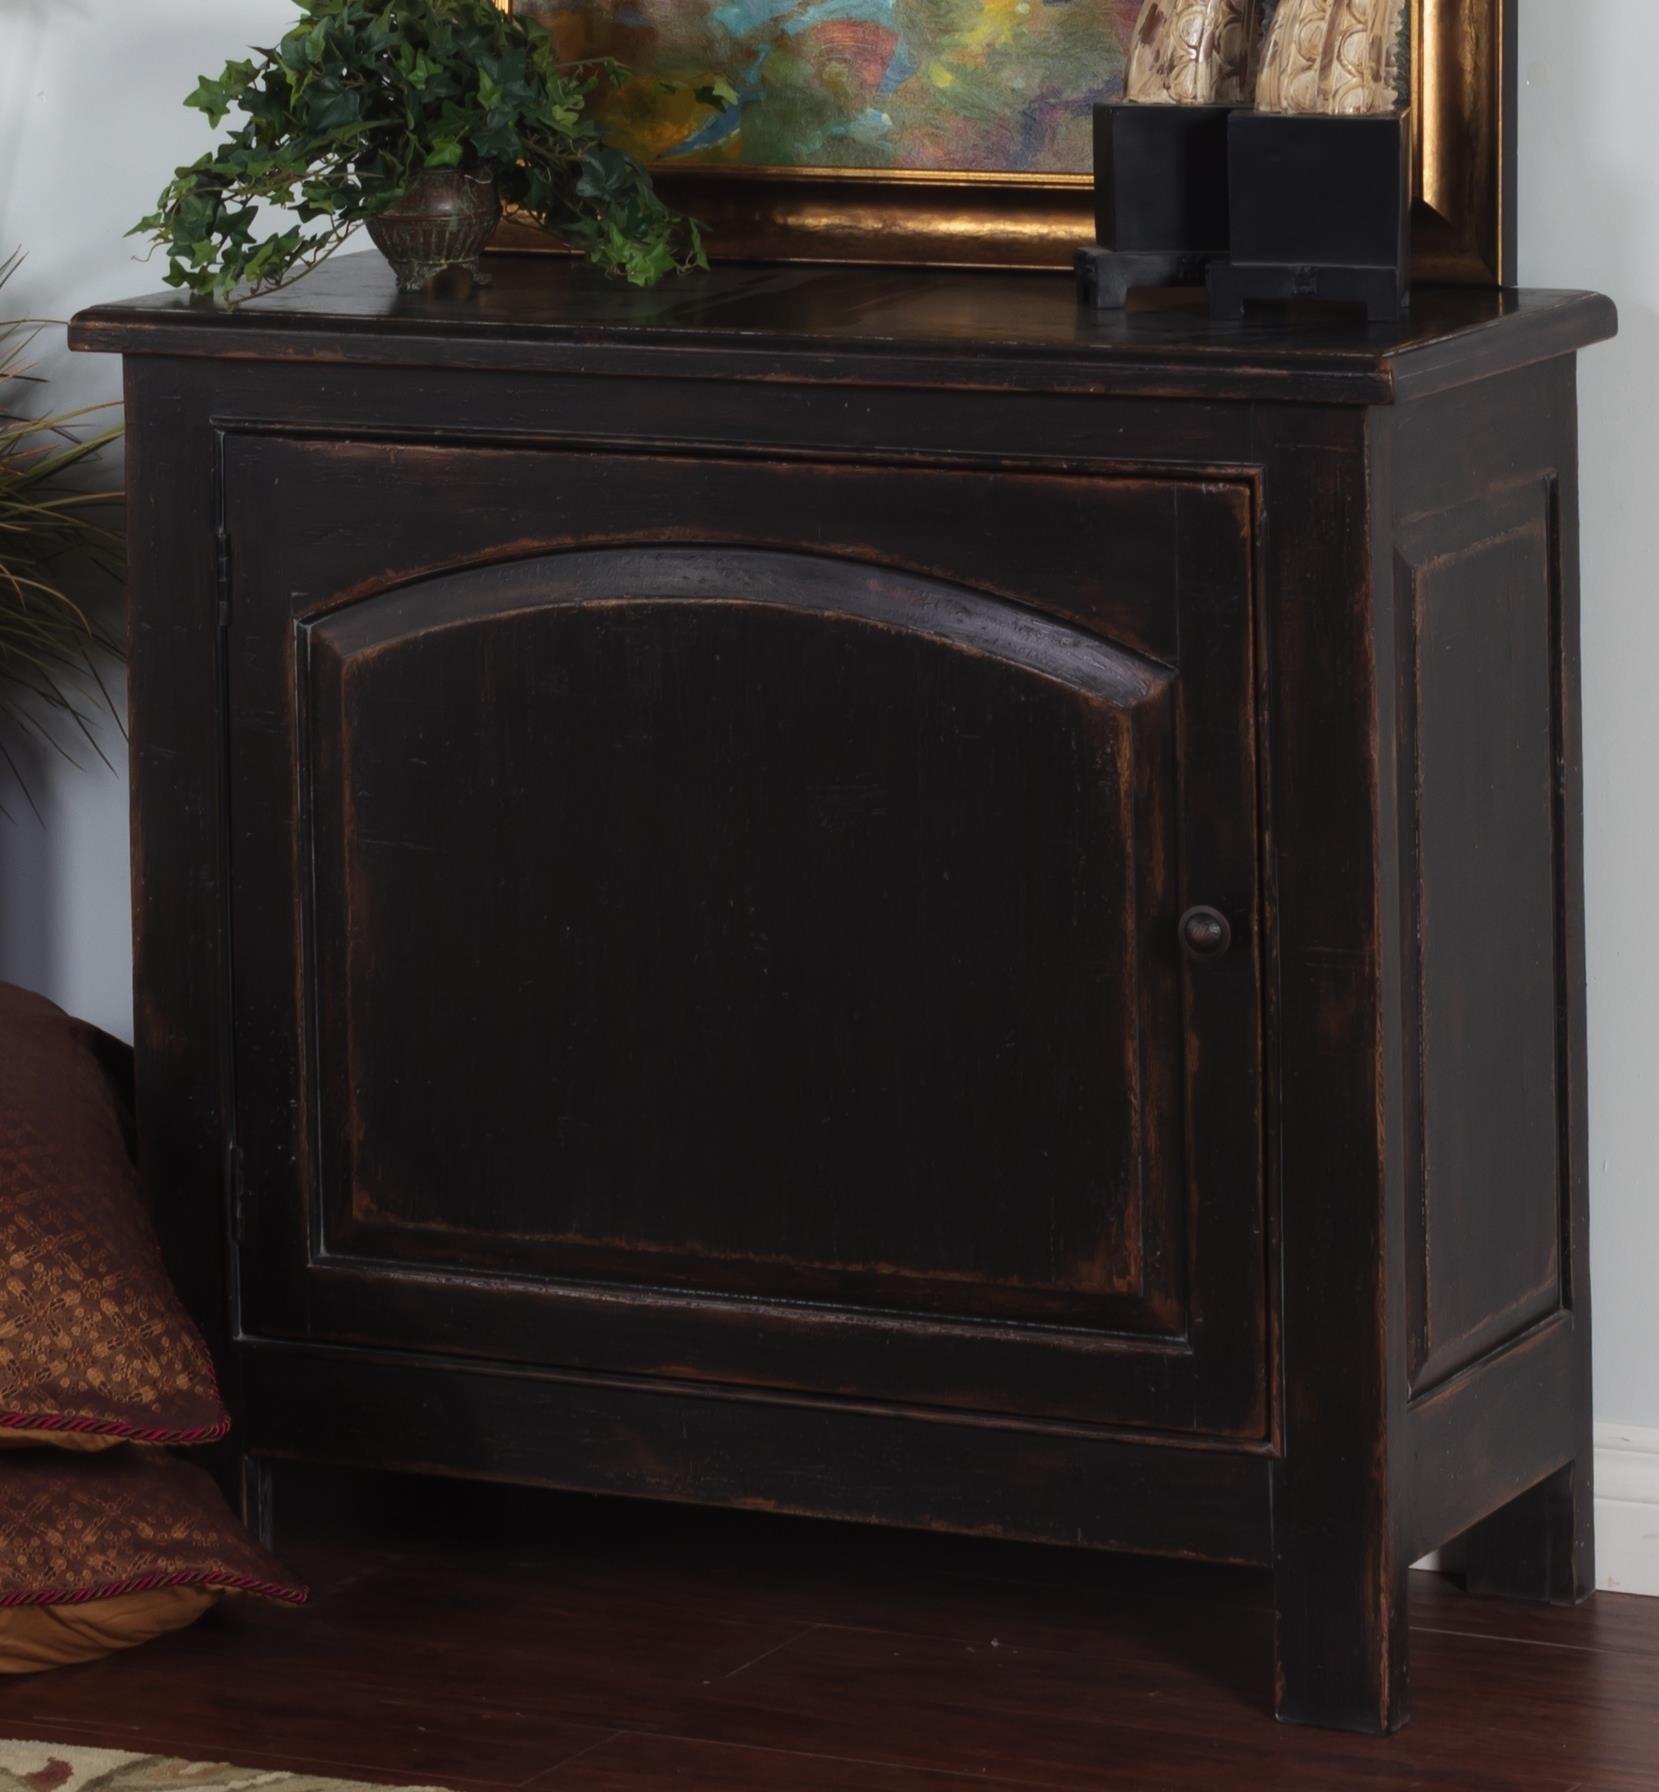 Morris Home Furnishings Meiomi Meiomi Arch Door Chest - Item Number: 510706278